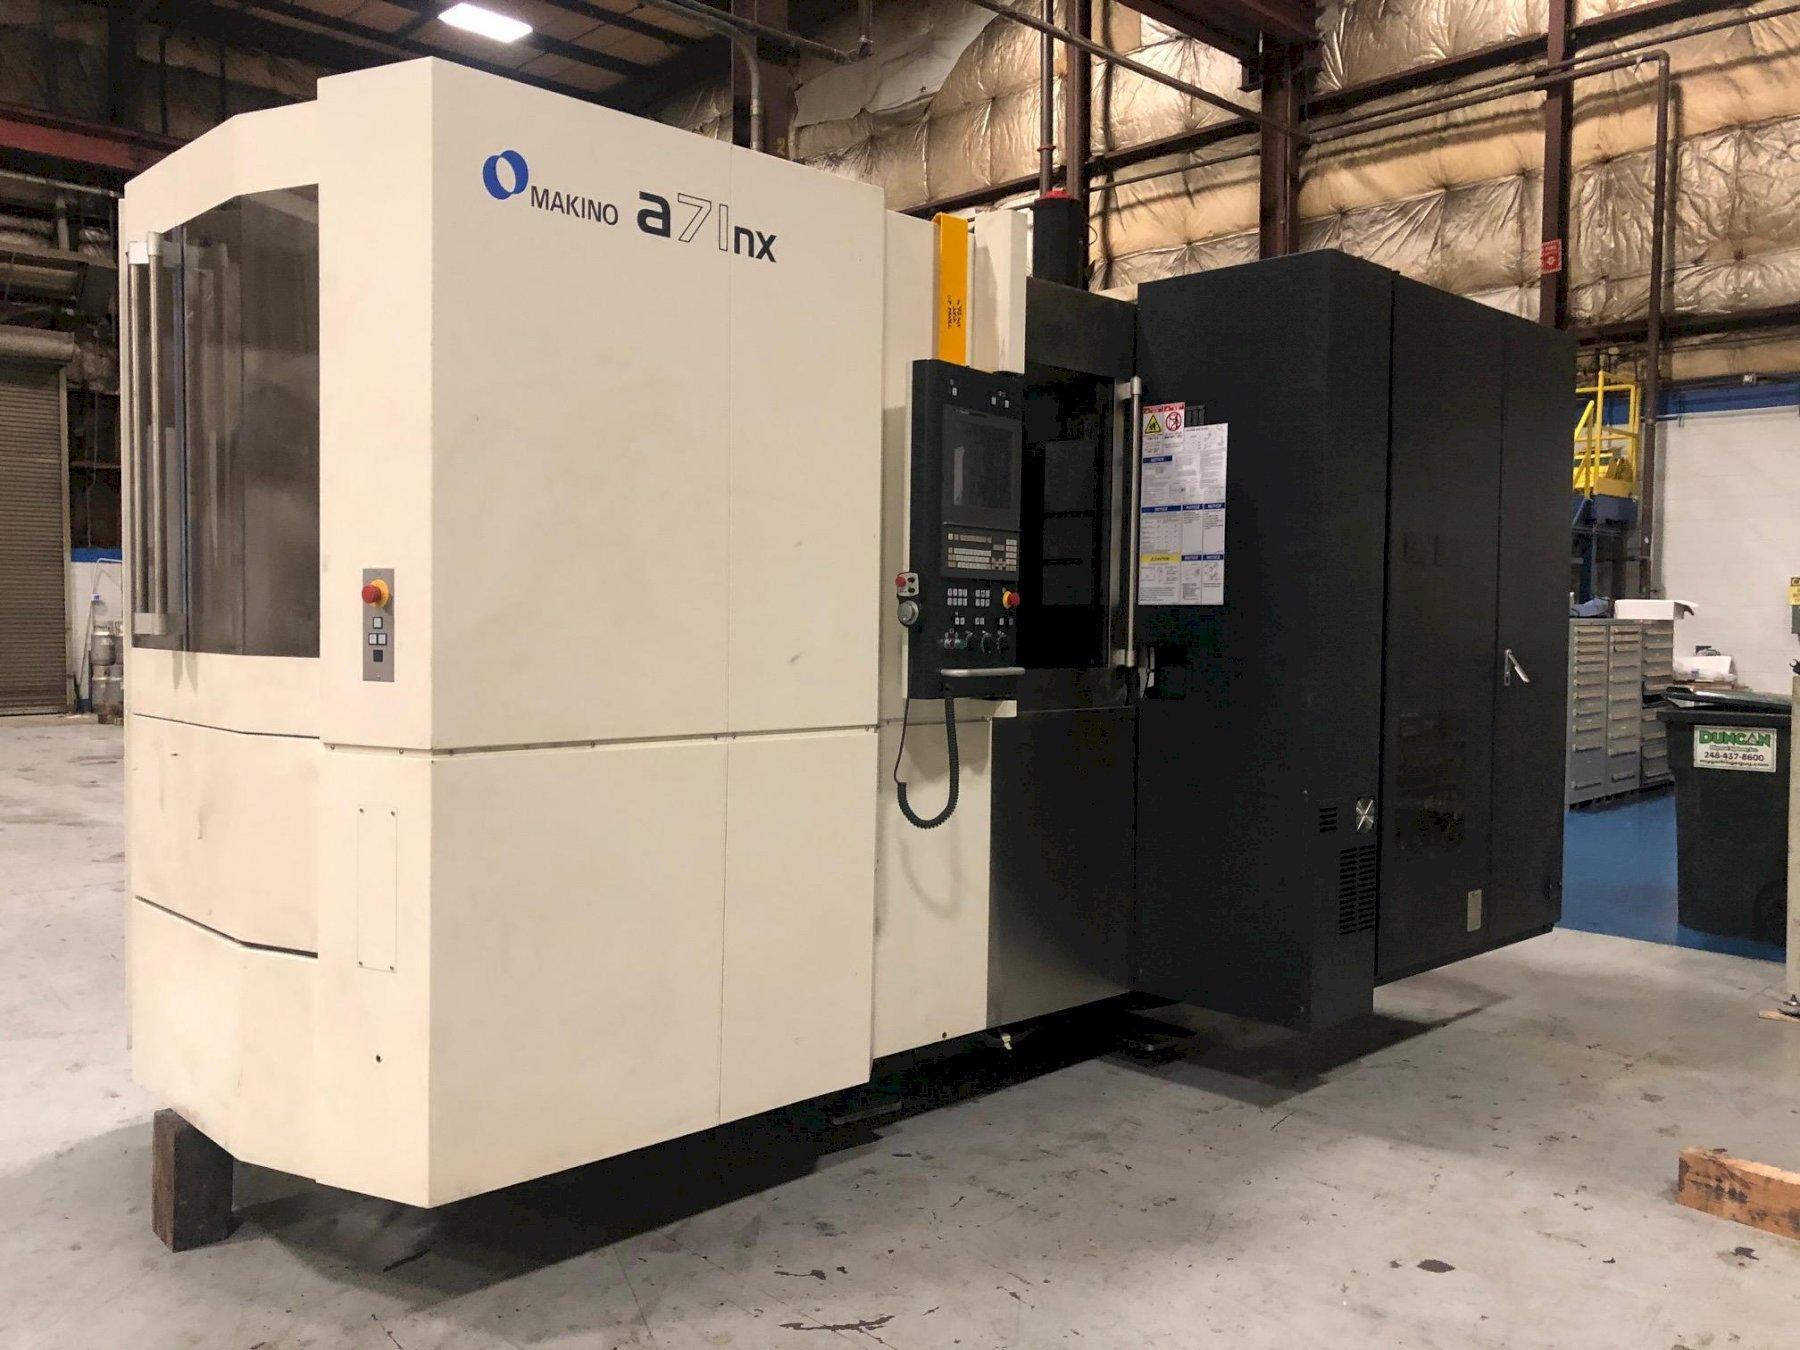 Makino a71NX CNC Horizontal Machining Center - 2019